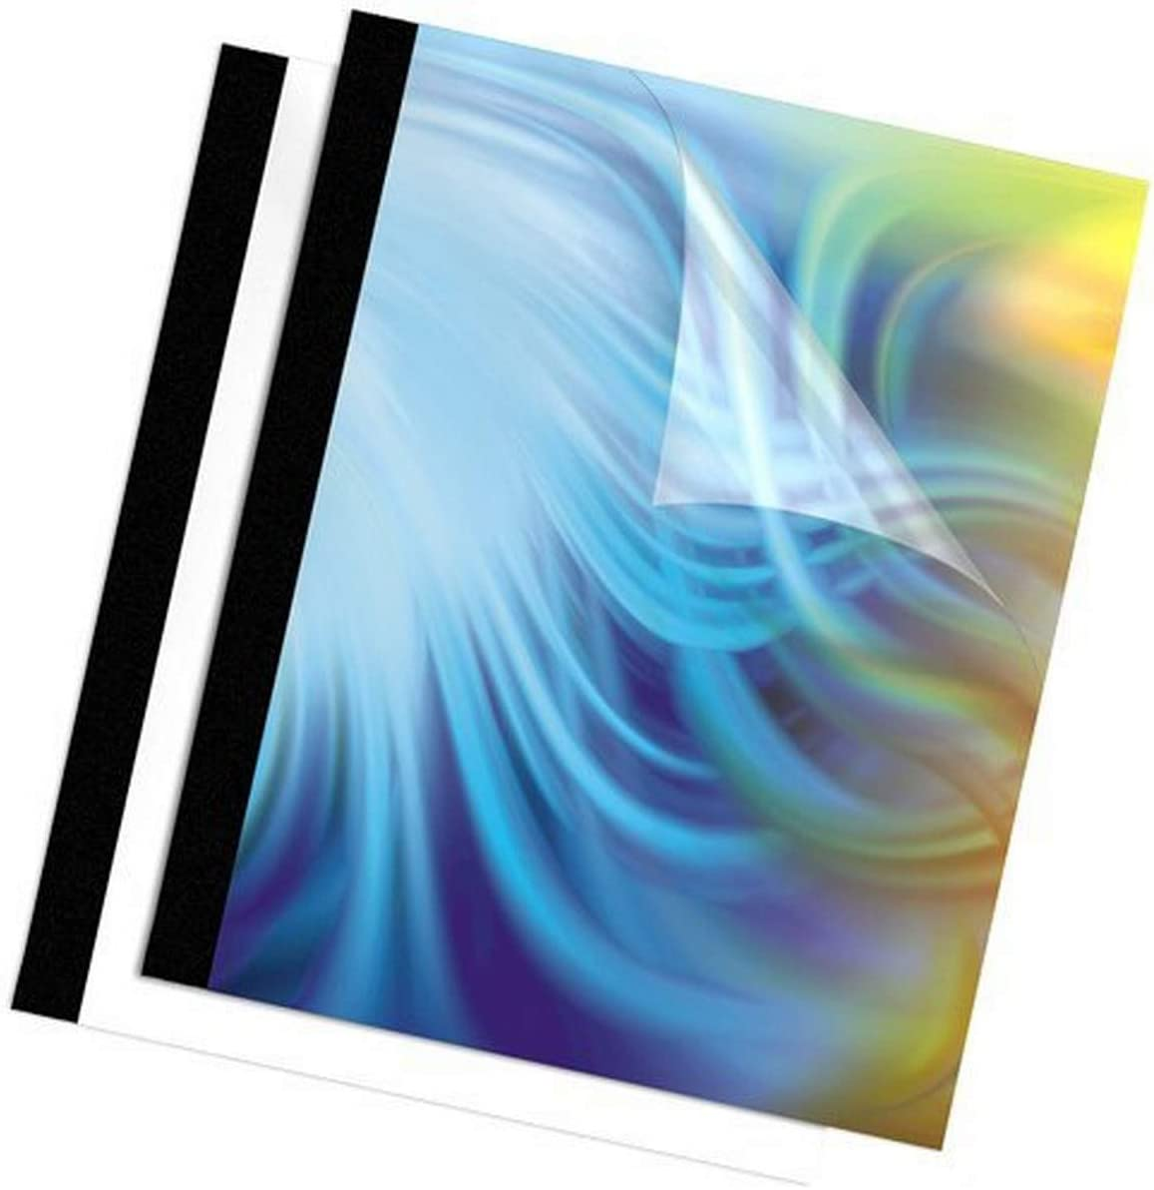 Fellowes Nashville-Davidson Mall Binding Thermal Presentation shipfree Covers 1 240 Black Inch